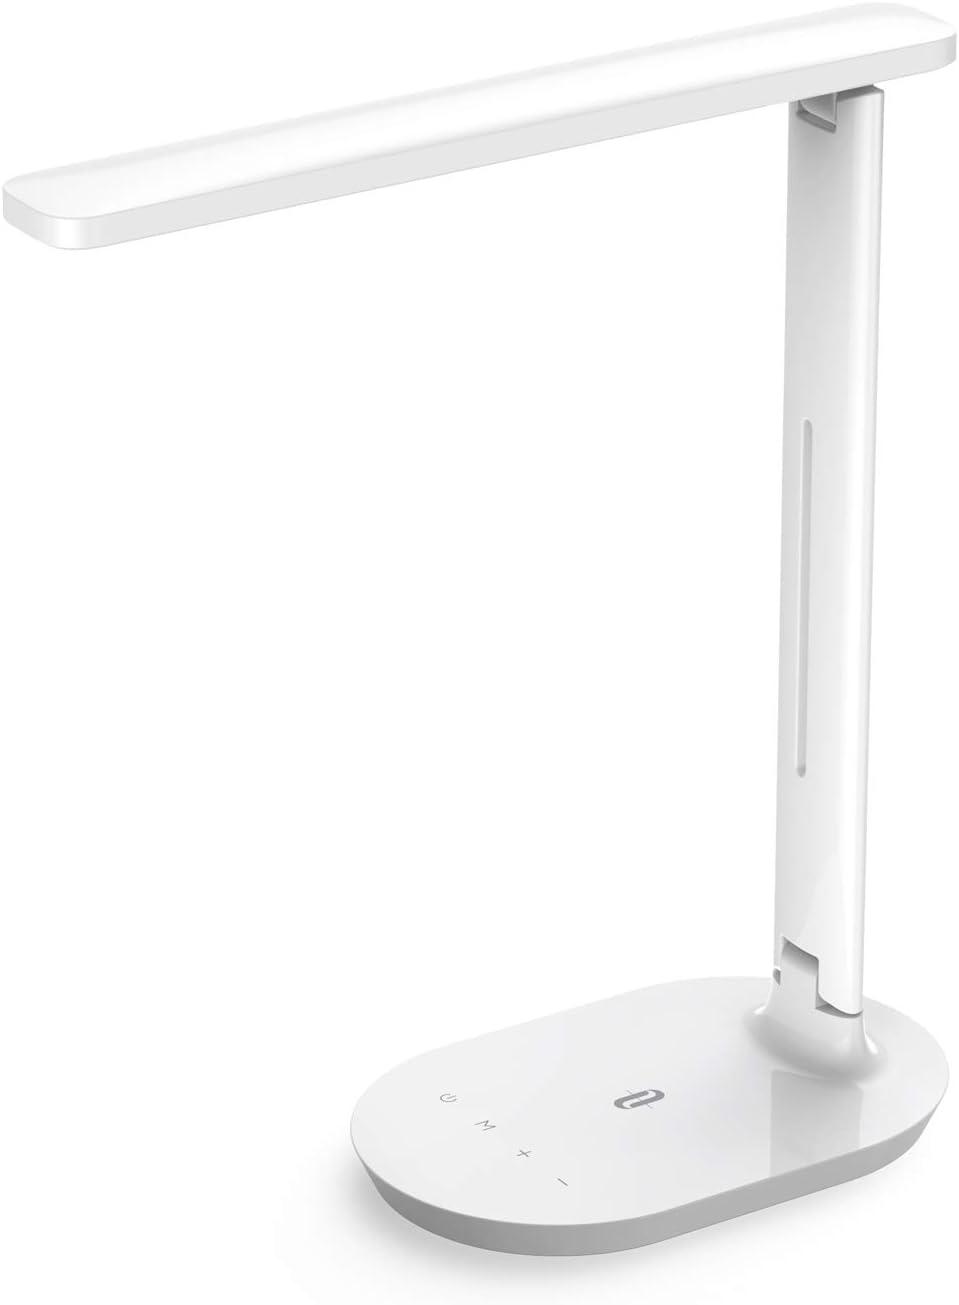 Lámpara Escritorio LED TaoTronics Flexo de Escritorio (5 Niveles de Brillo, 3 Modos, Función de Memoria, Control Táctil) Lámpara de Mesa,Lámpara de Oficina para Leer,Estudiar,Relajamiento,Blanco